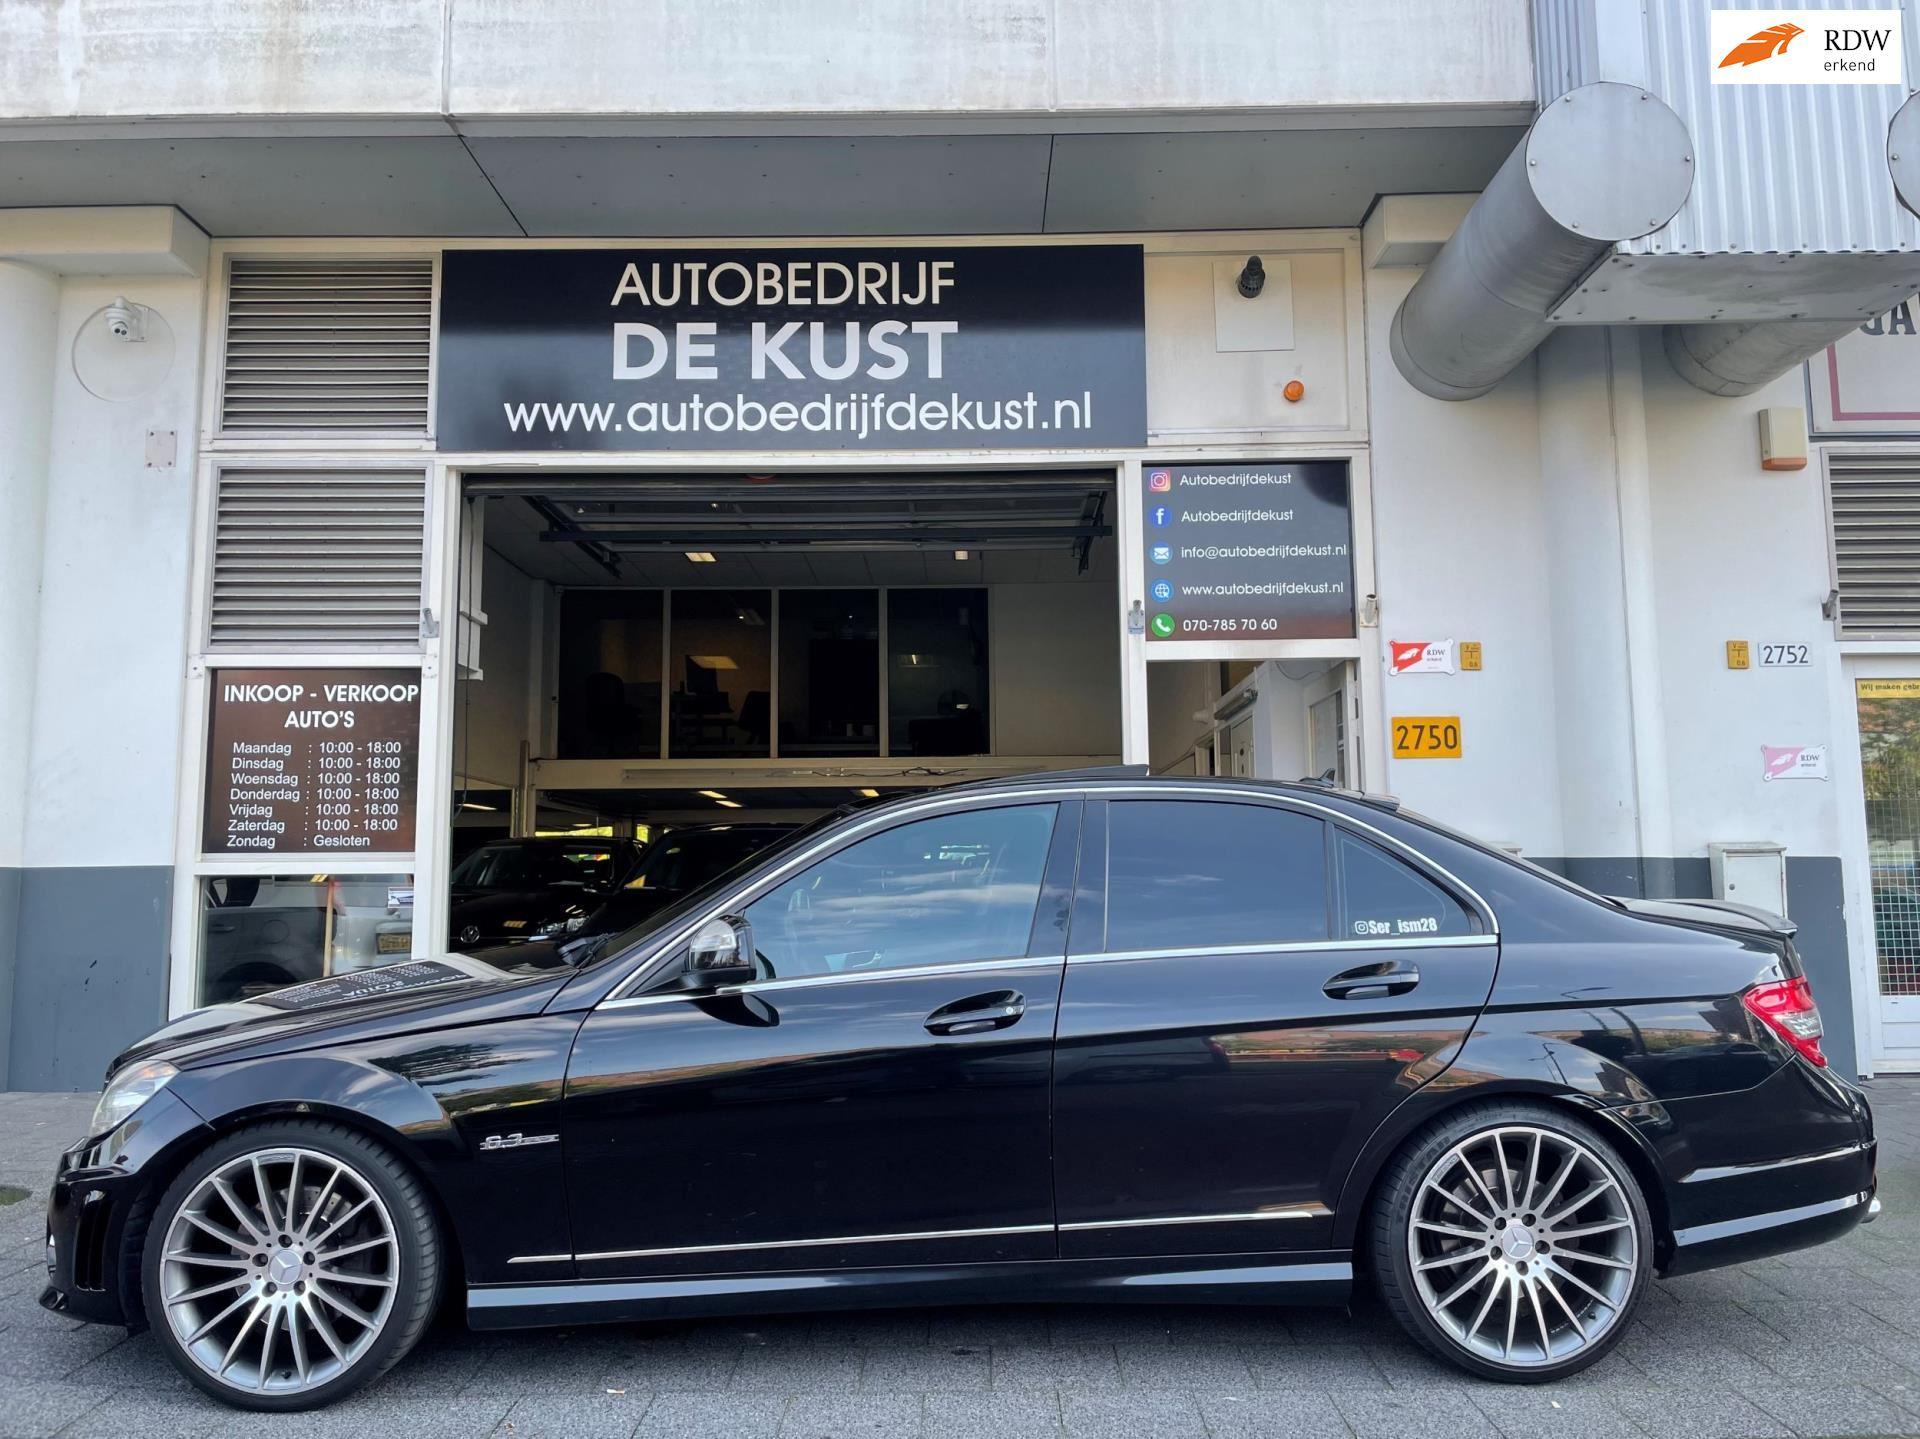 Mercedes-Benz C-klasse occasion - Autobedrijf De Kust B.V.